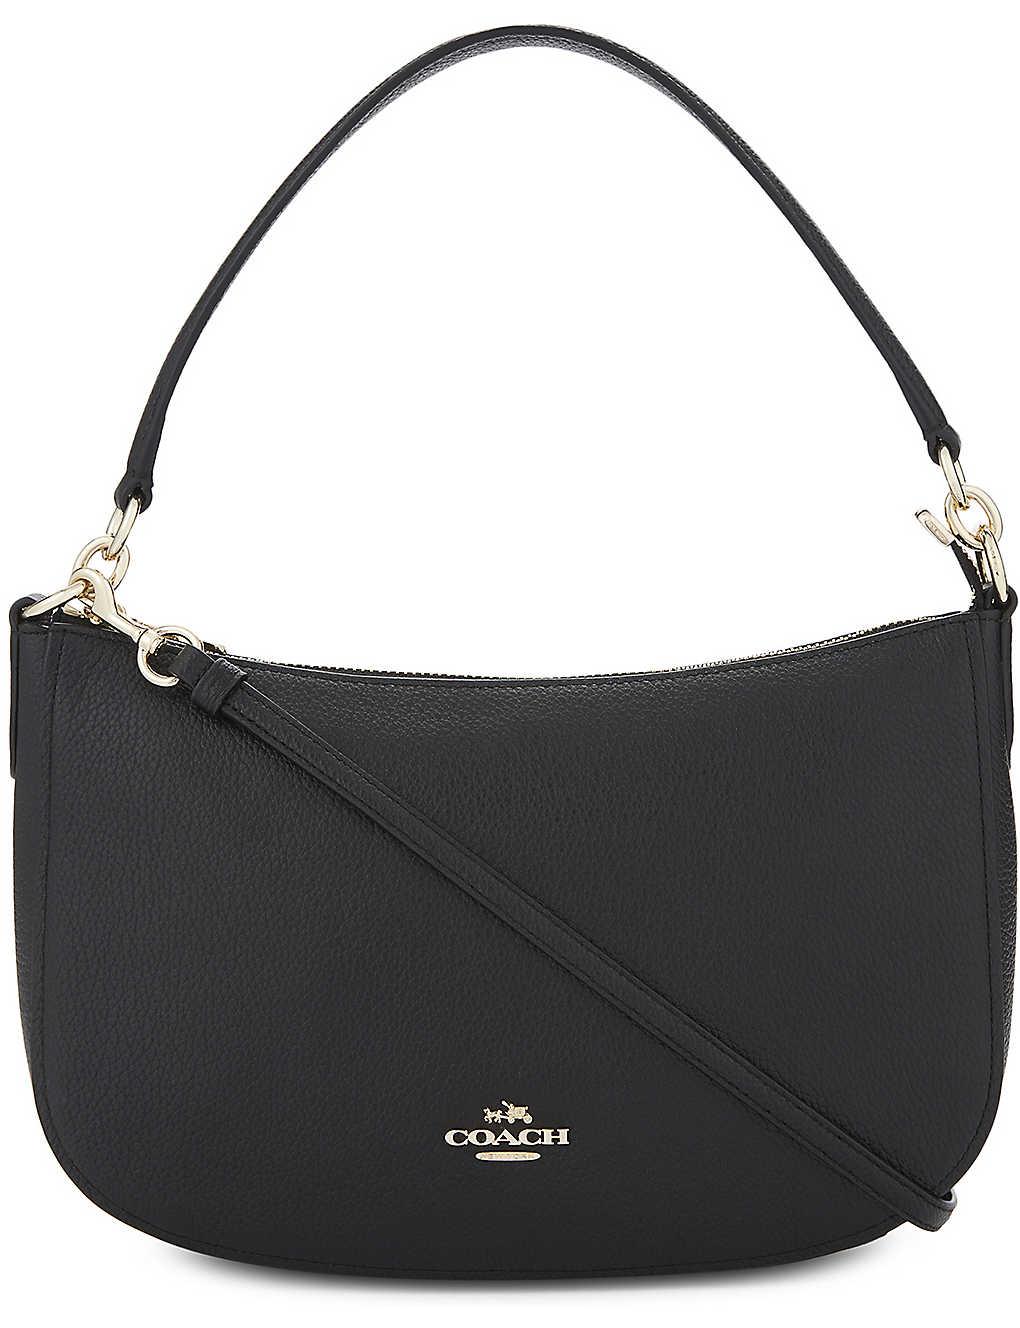 f4bfd42a4a7 COACH - Chelsea leather cross-body bag | Selfridges.com